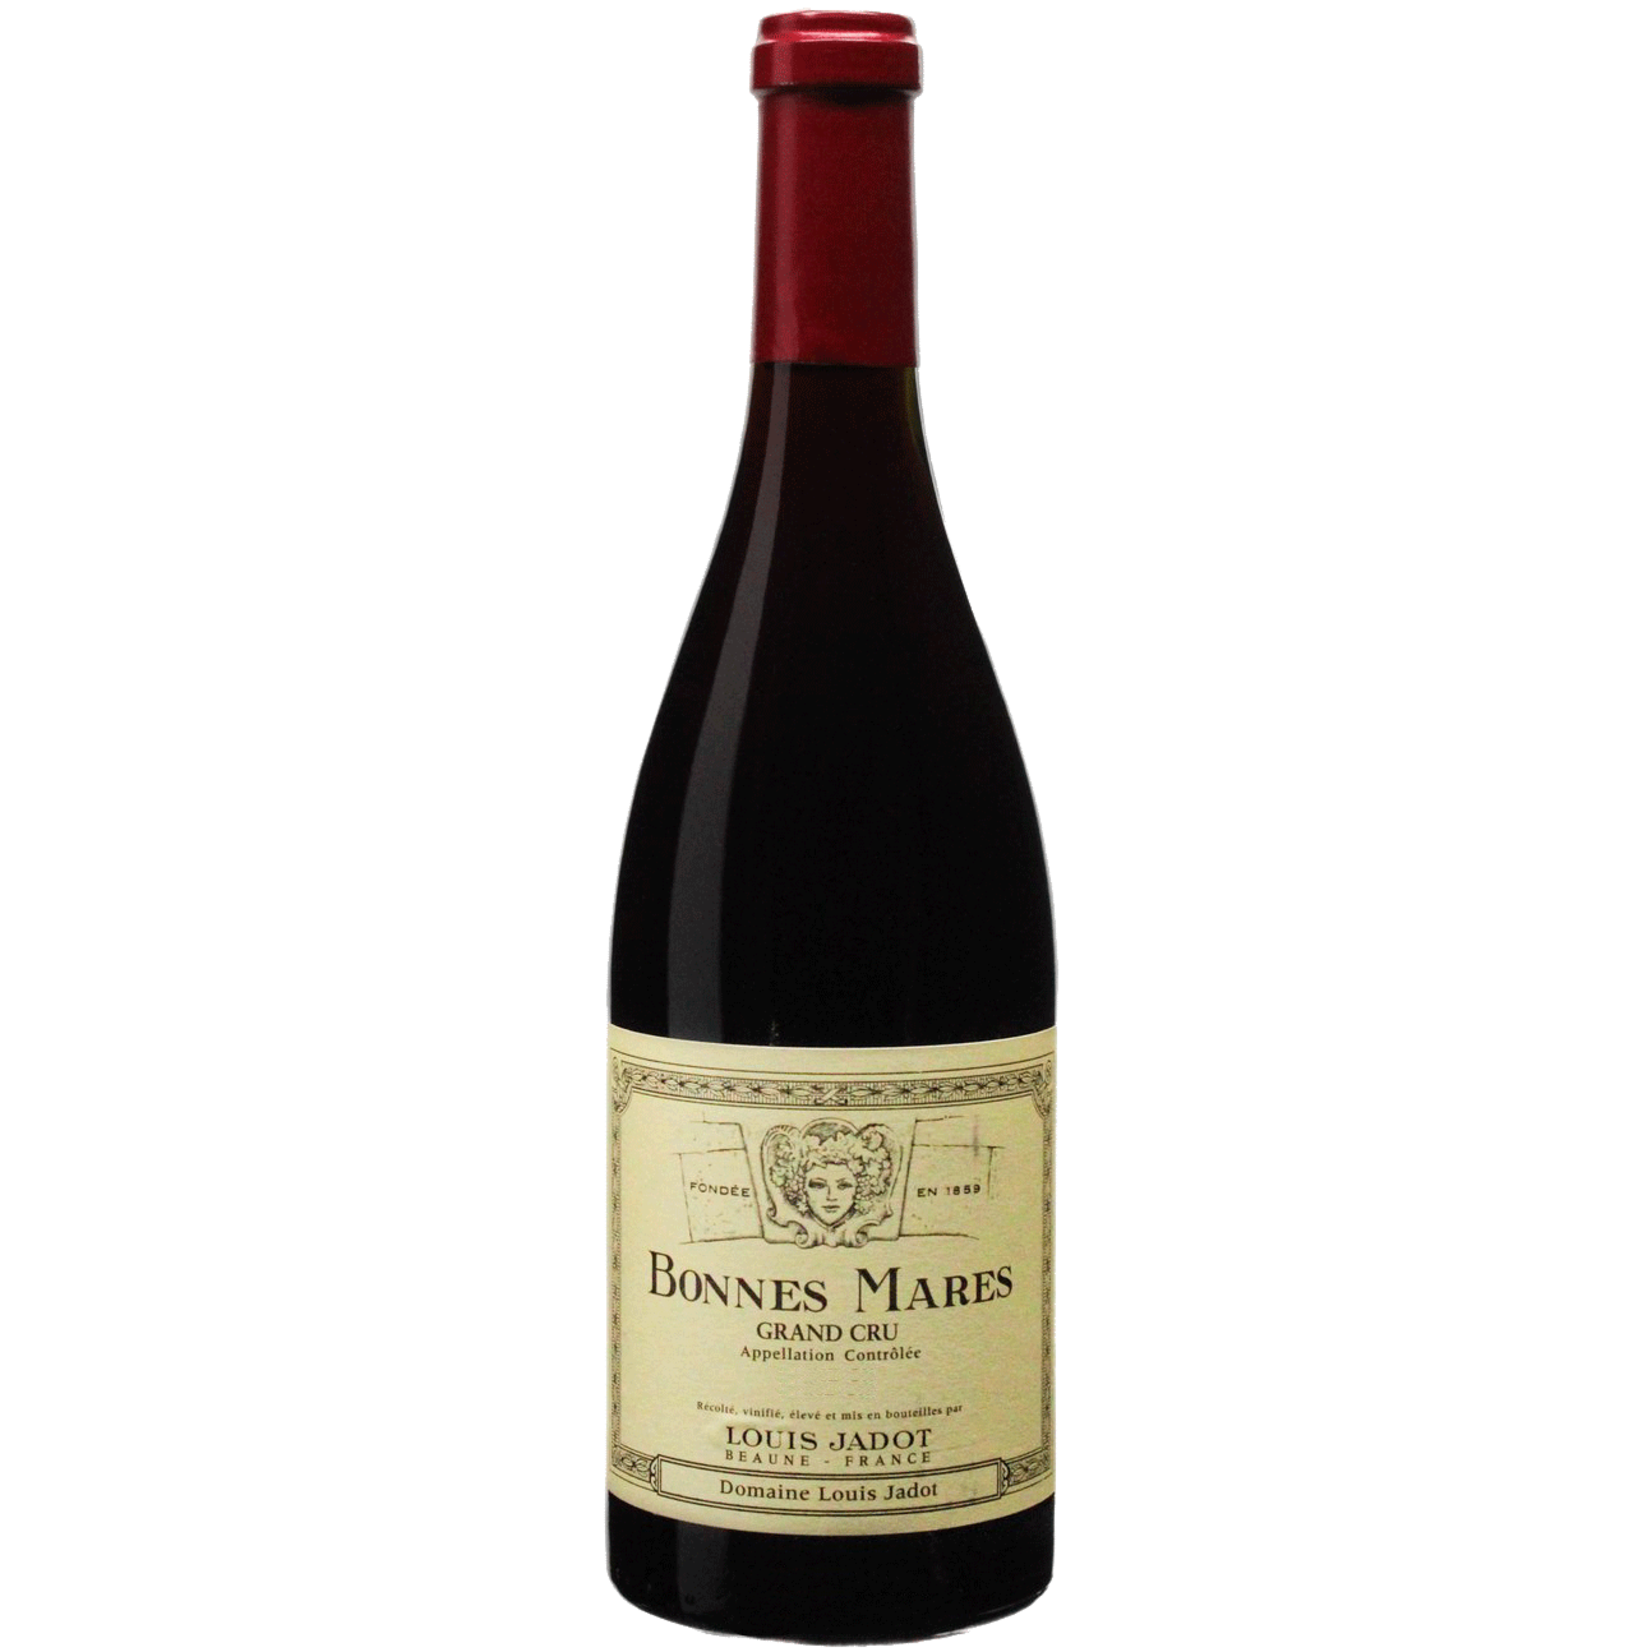 Wine Louis Jadot Bonnes Mares Grand Cru 2019